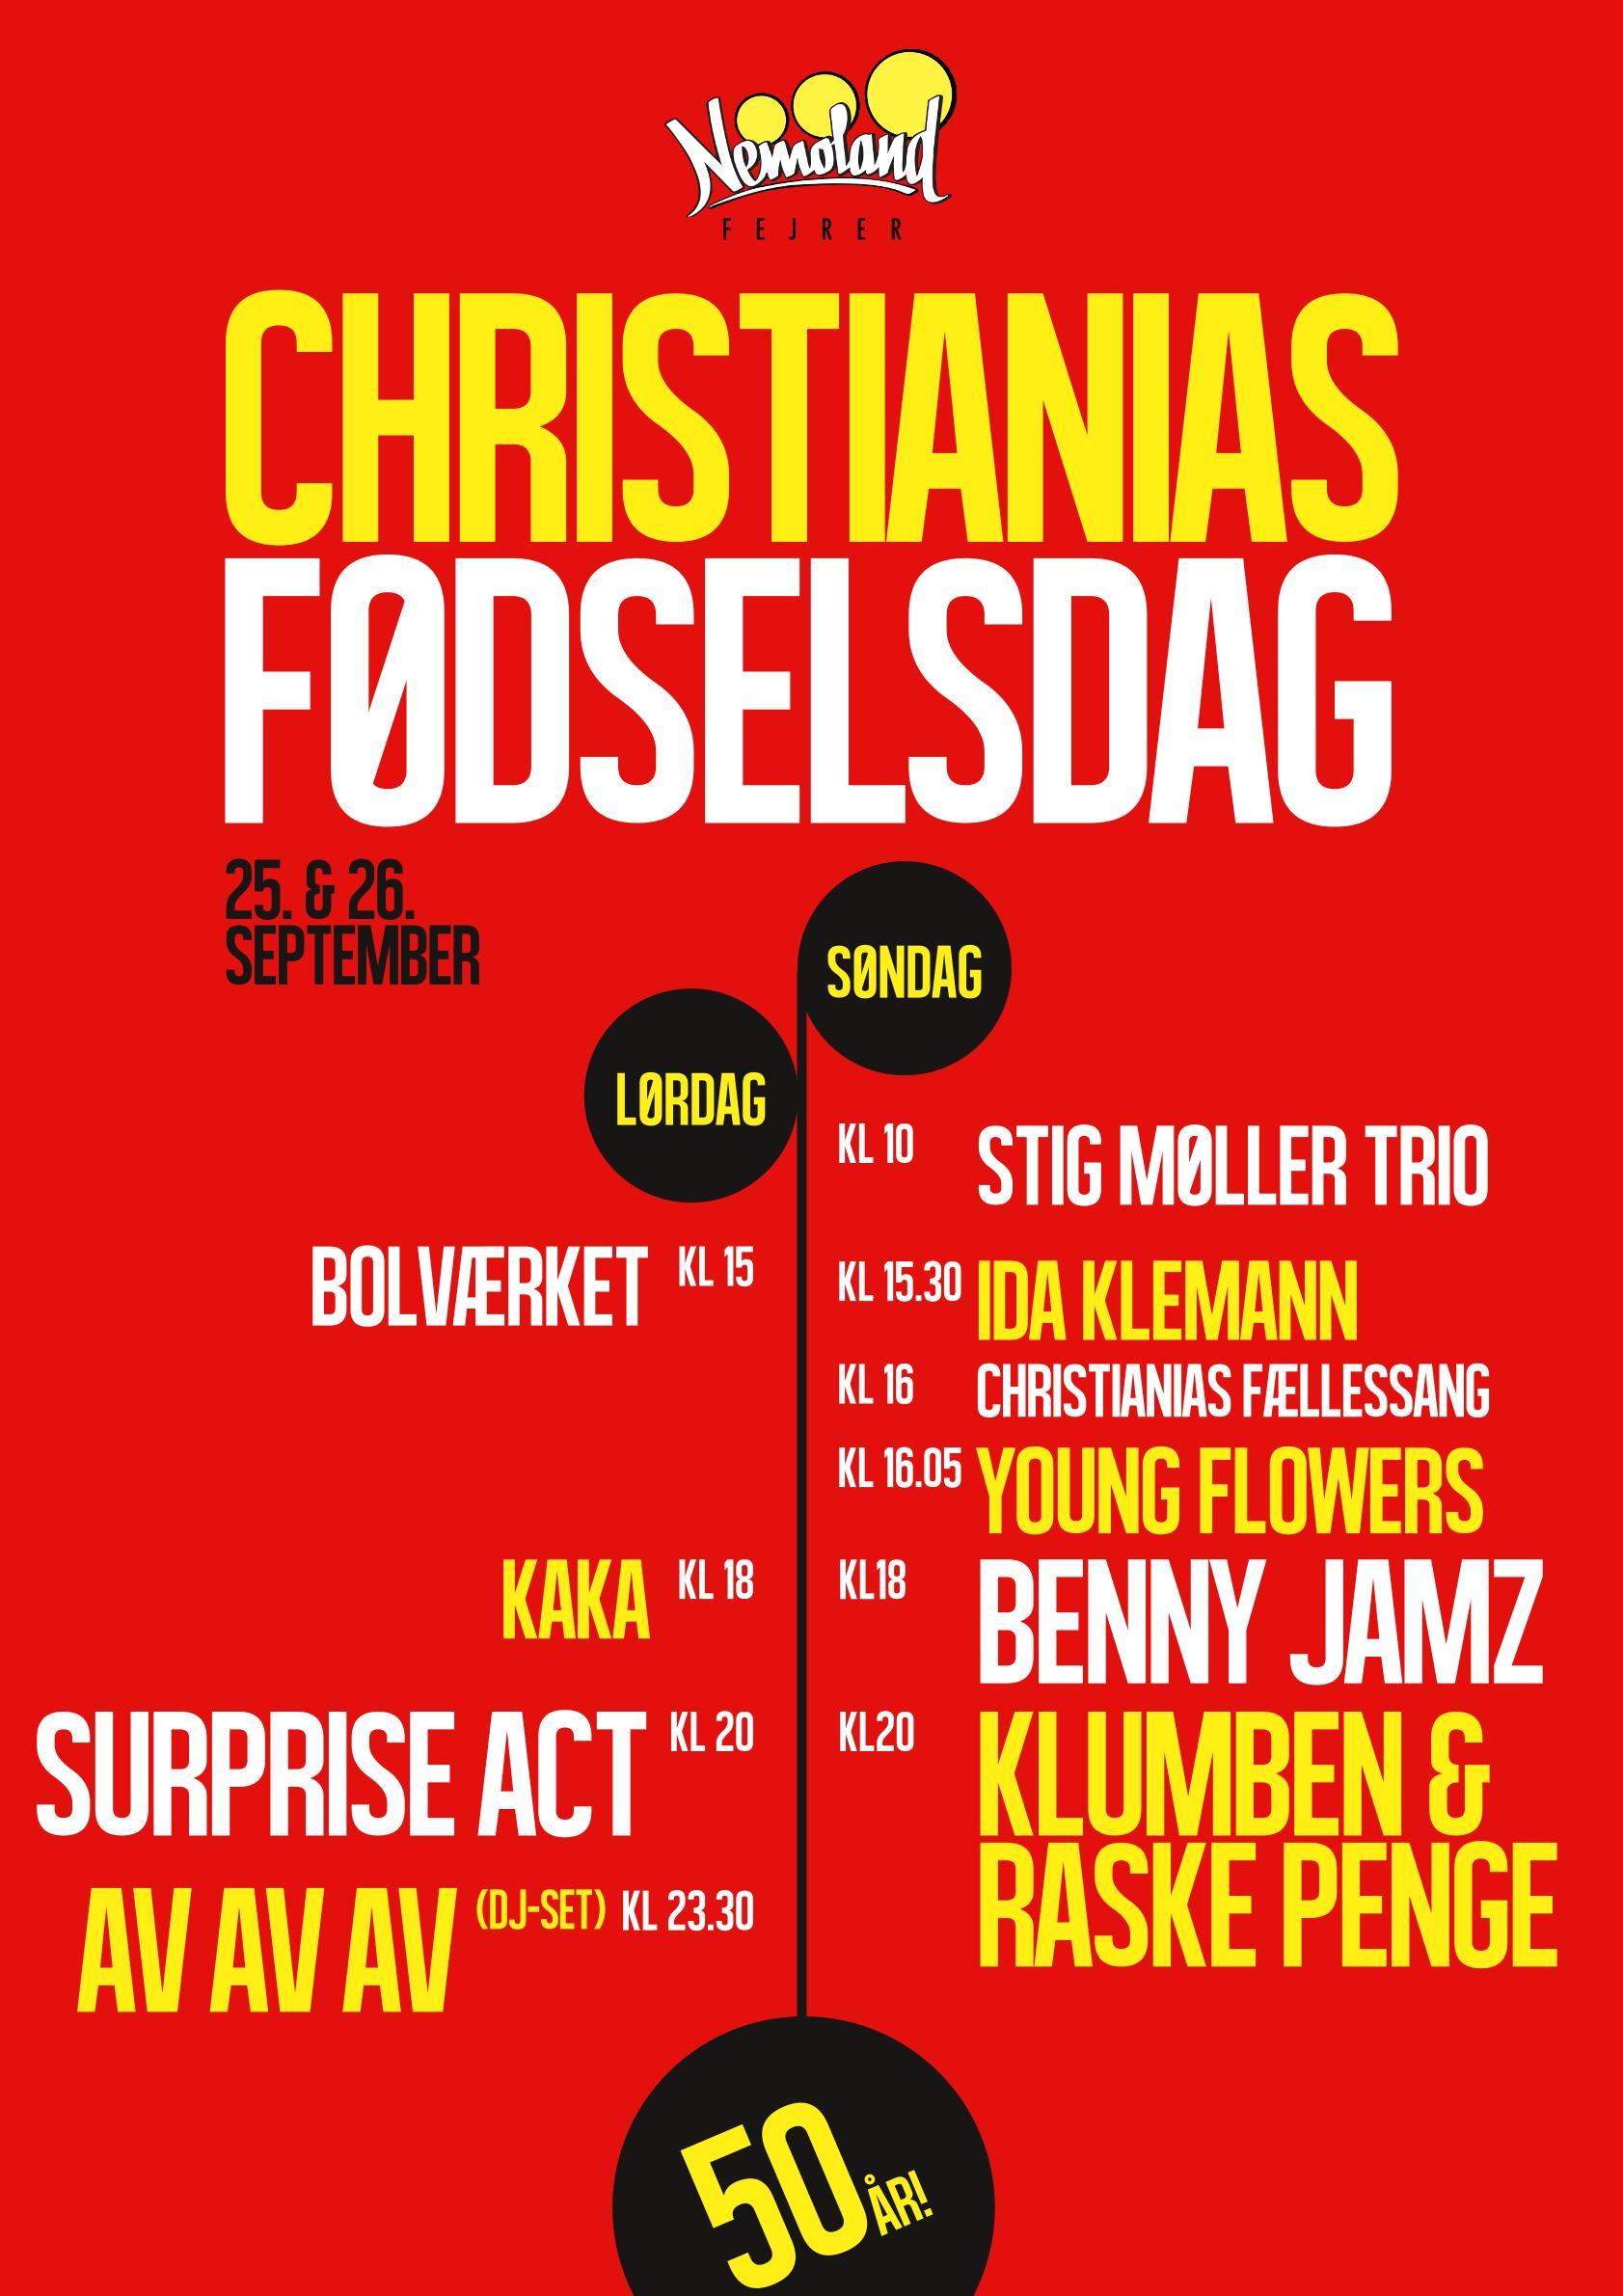 Christiania 50 år fødselsdag